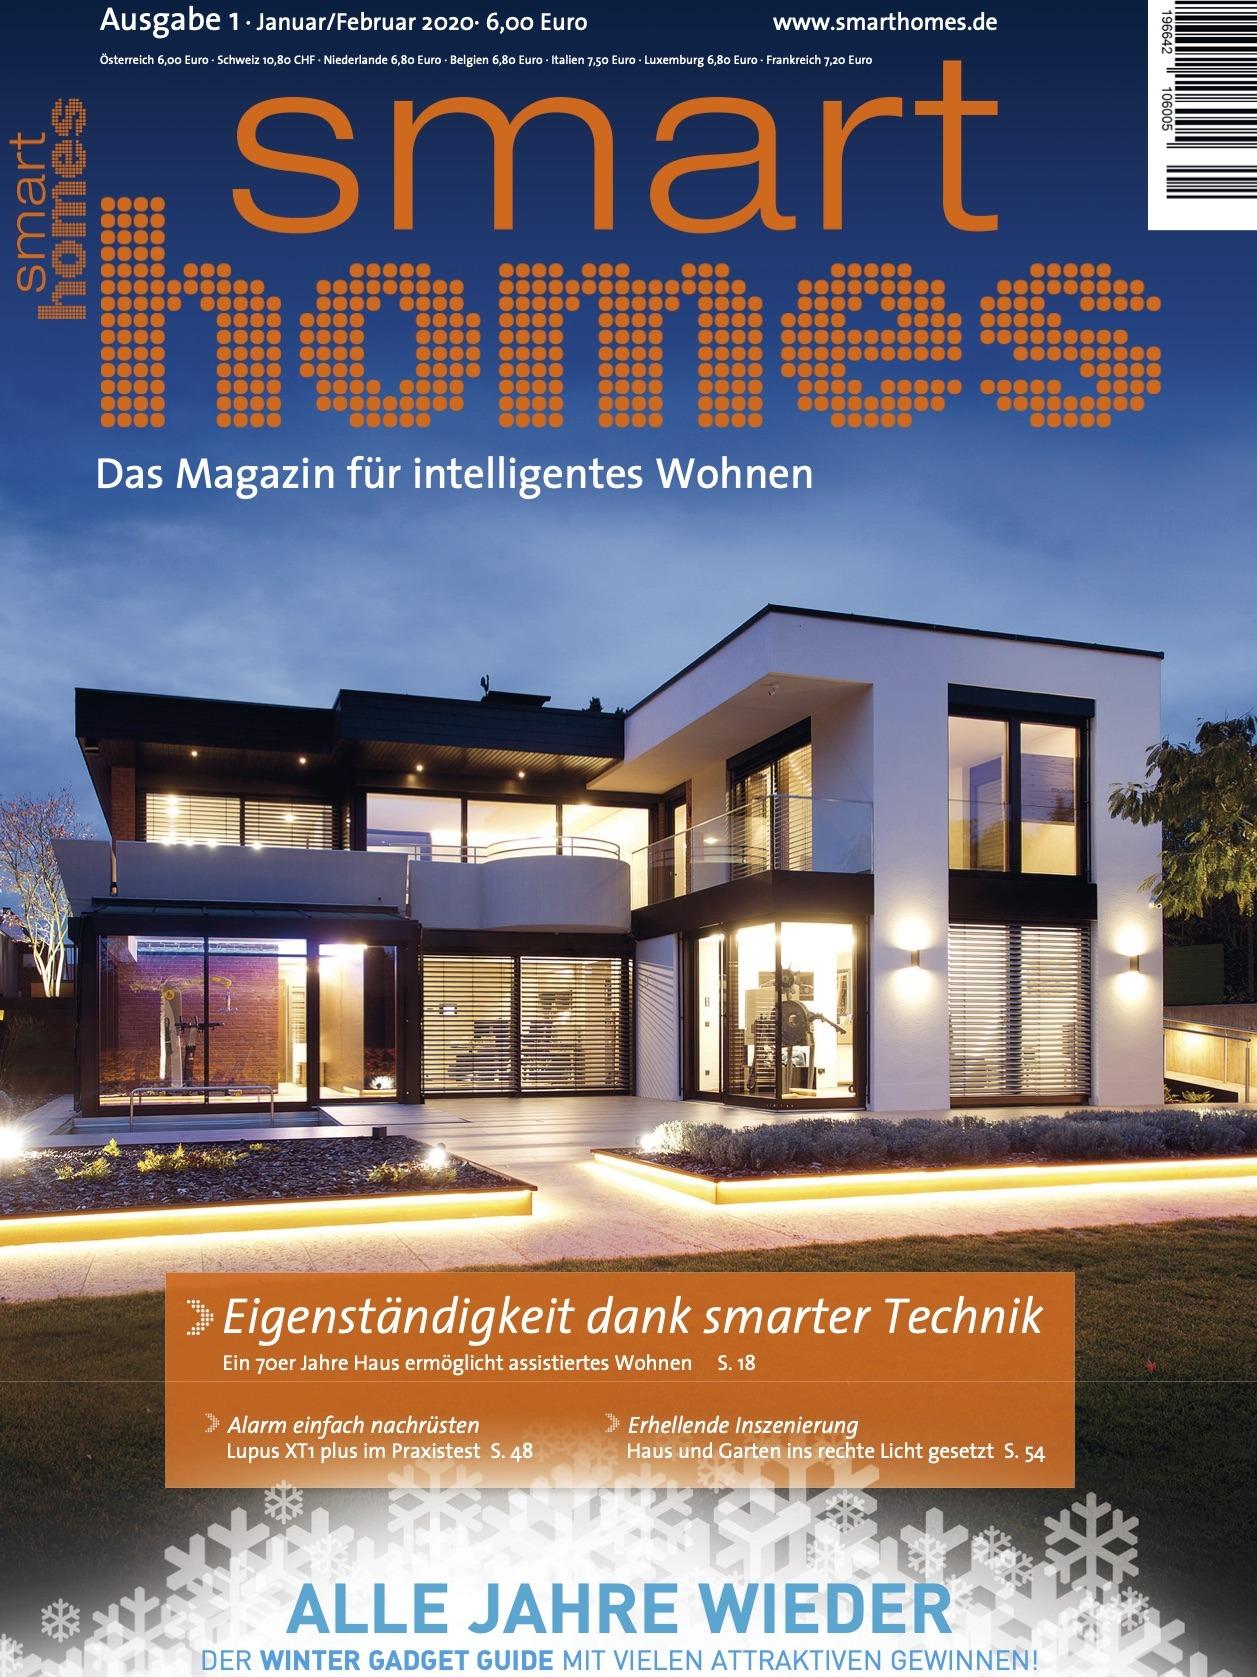 Smart Homes 1.2020